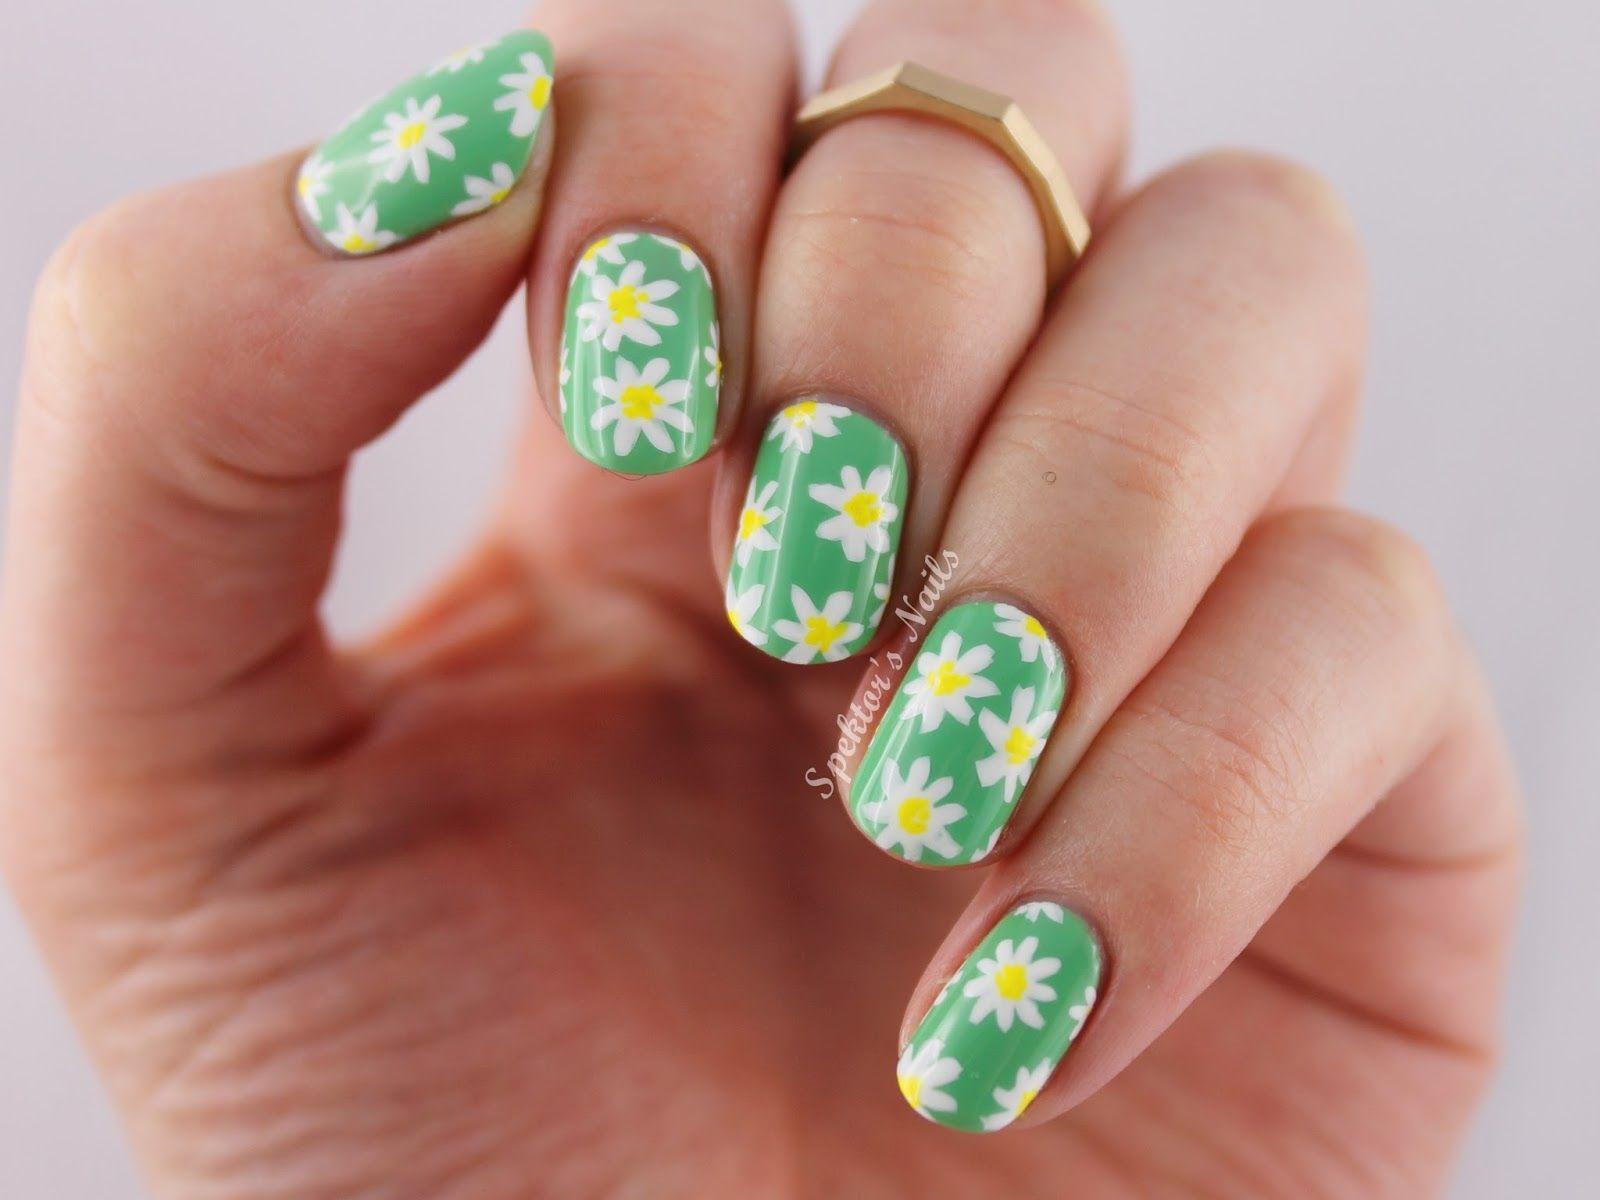 The Lacquer Legion Garden: Daisies Nail Art #prom nail art | Nails ...